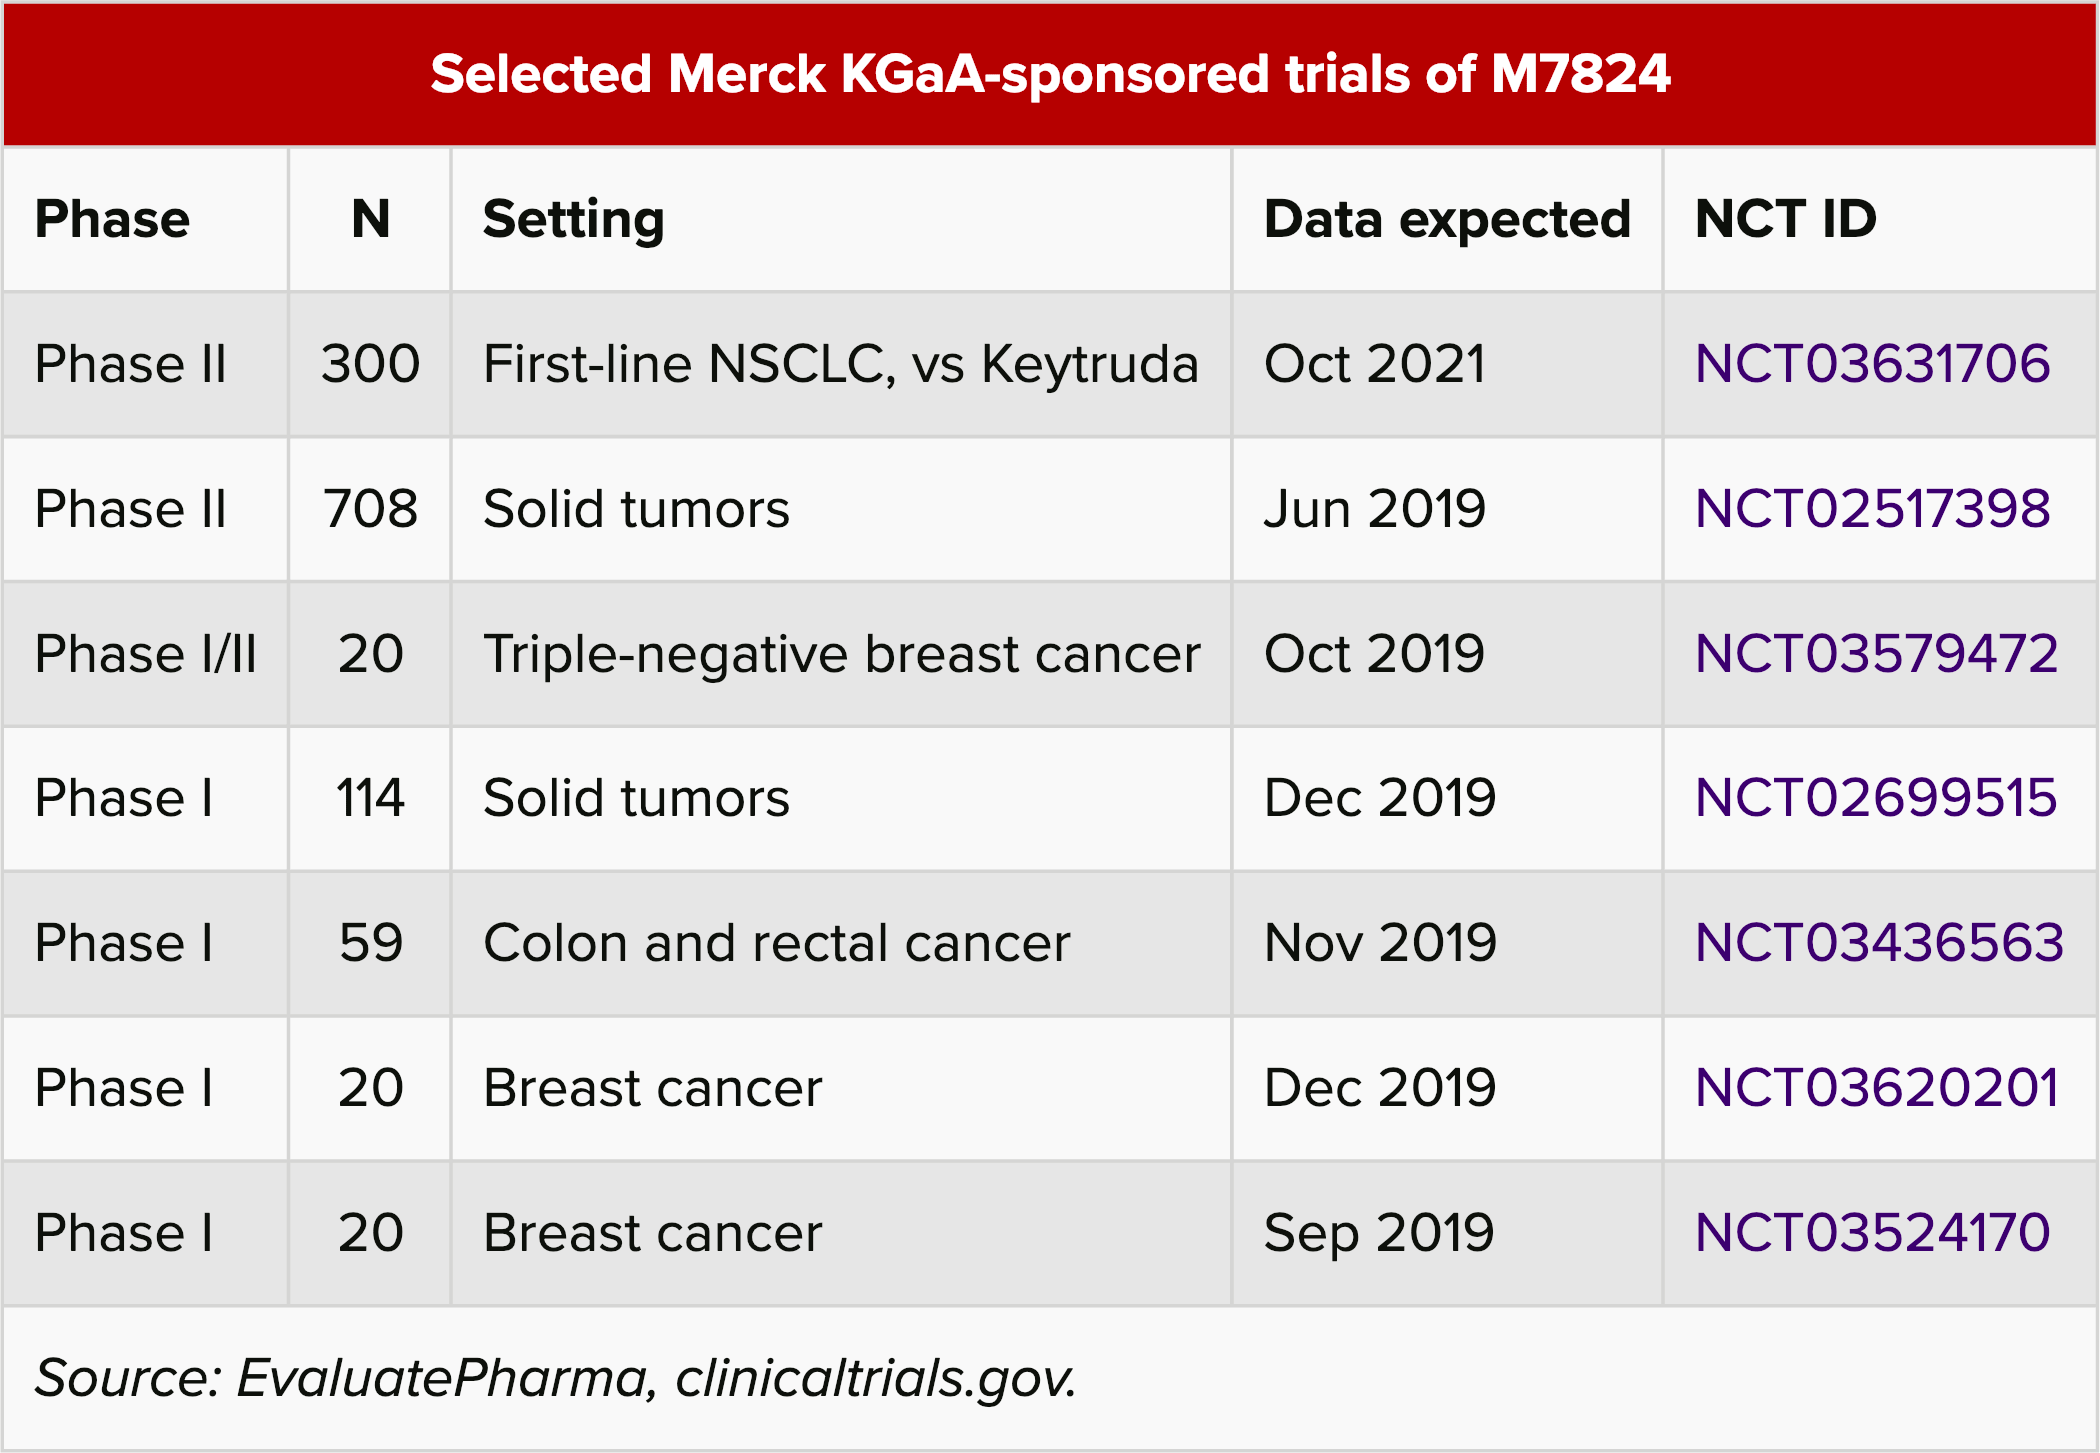 selected merck kgaa sponsored trials of m7824 - GlaxoSmithKline и Merck KGaA: иммуноонкологический альянс на четыре миллиарда долларов